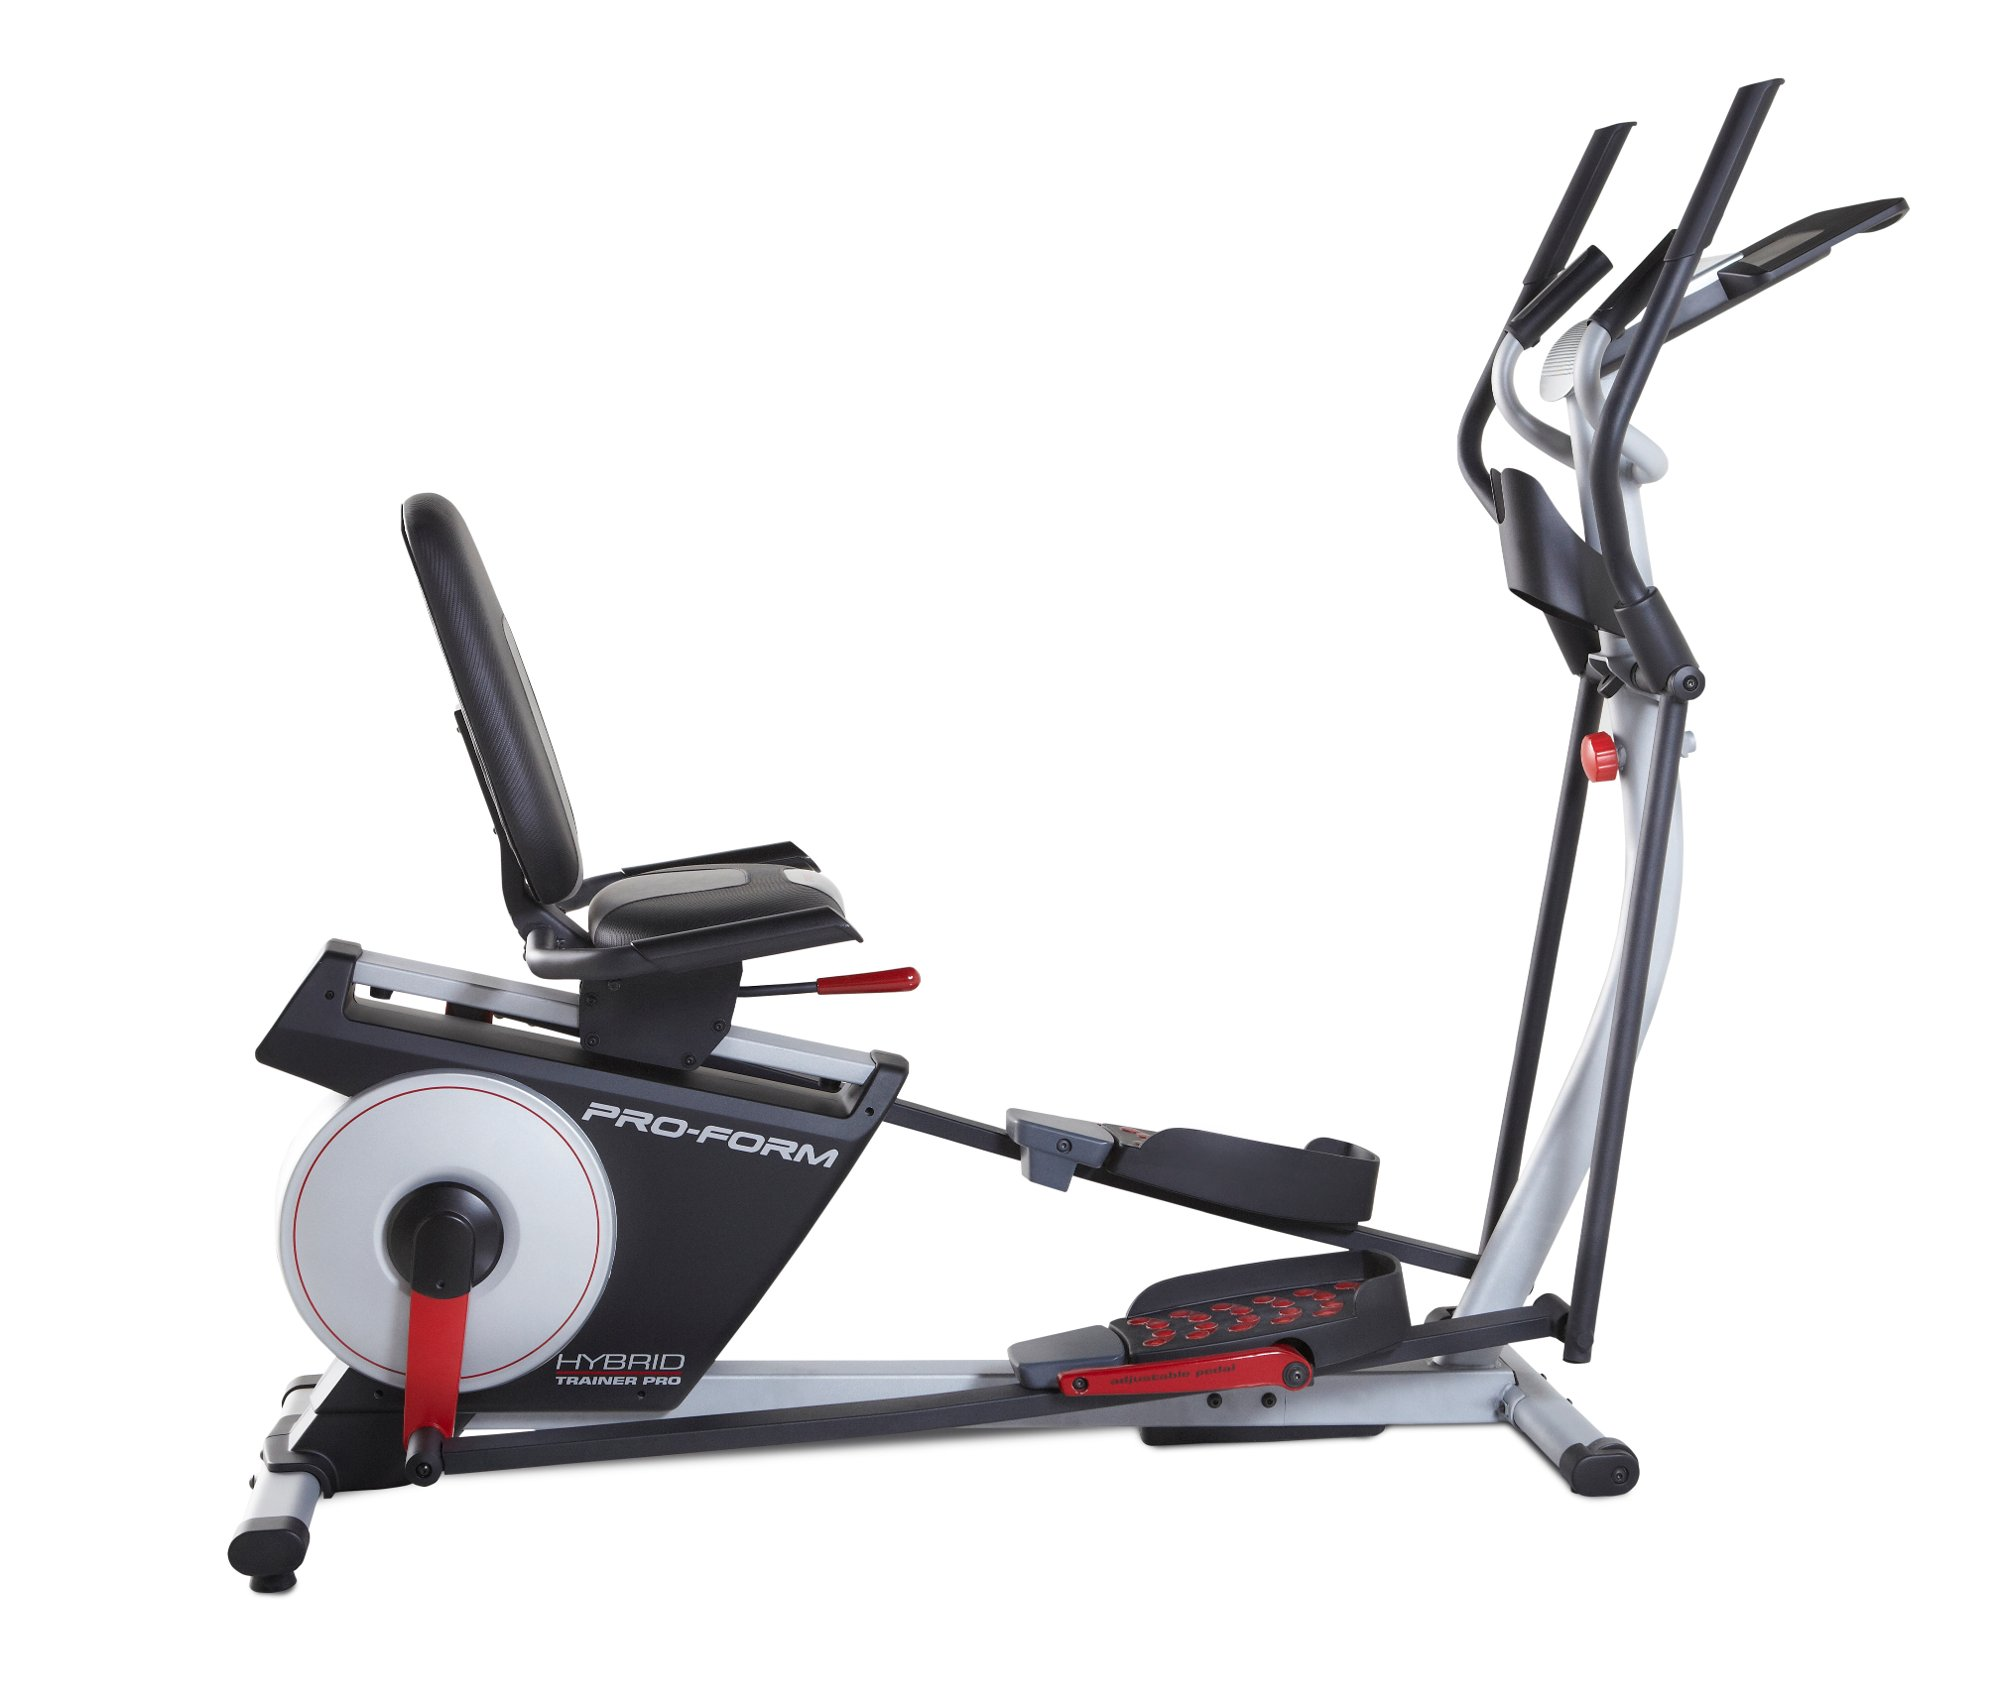 ProForm Hybrid Trainer Pro Recumbent bike workout